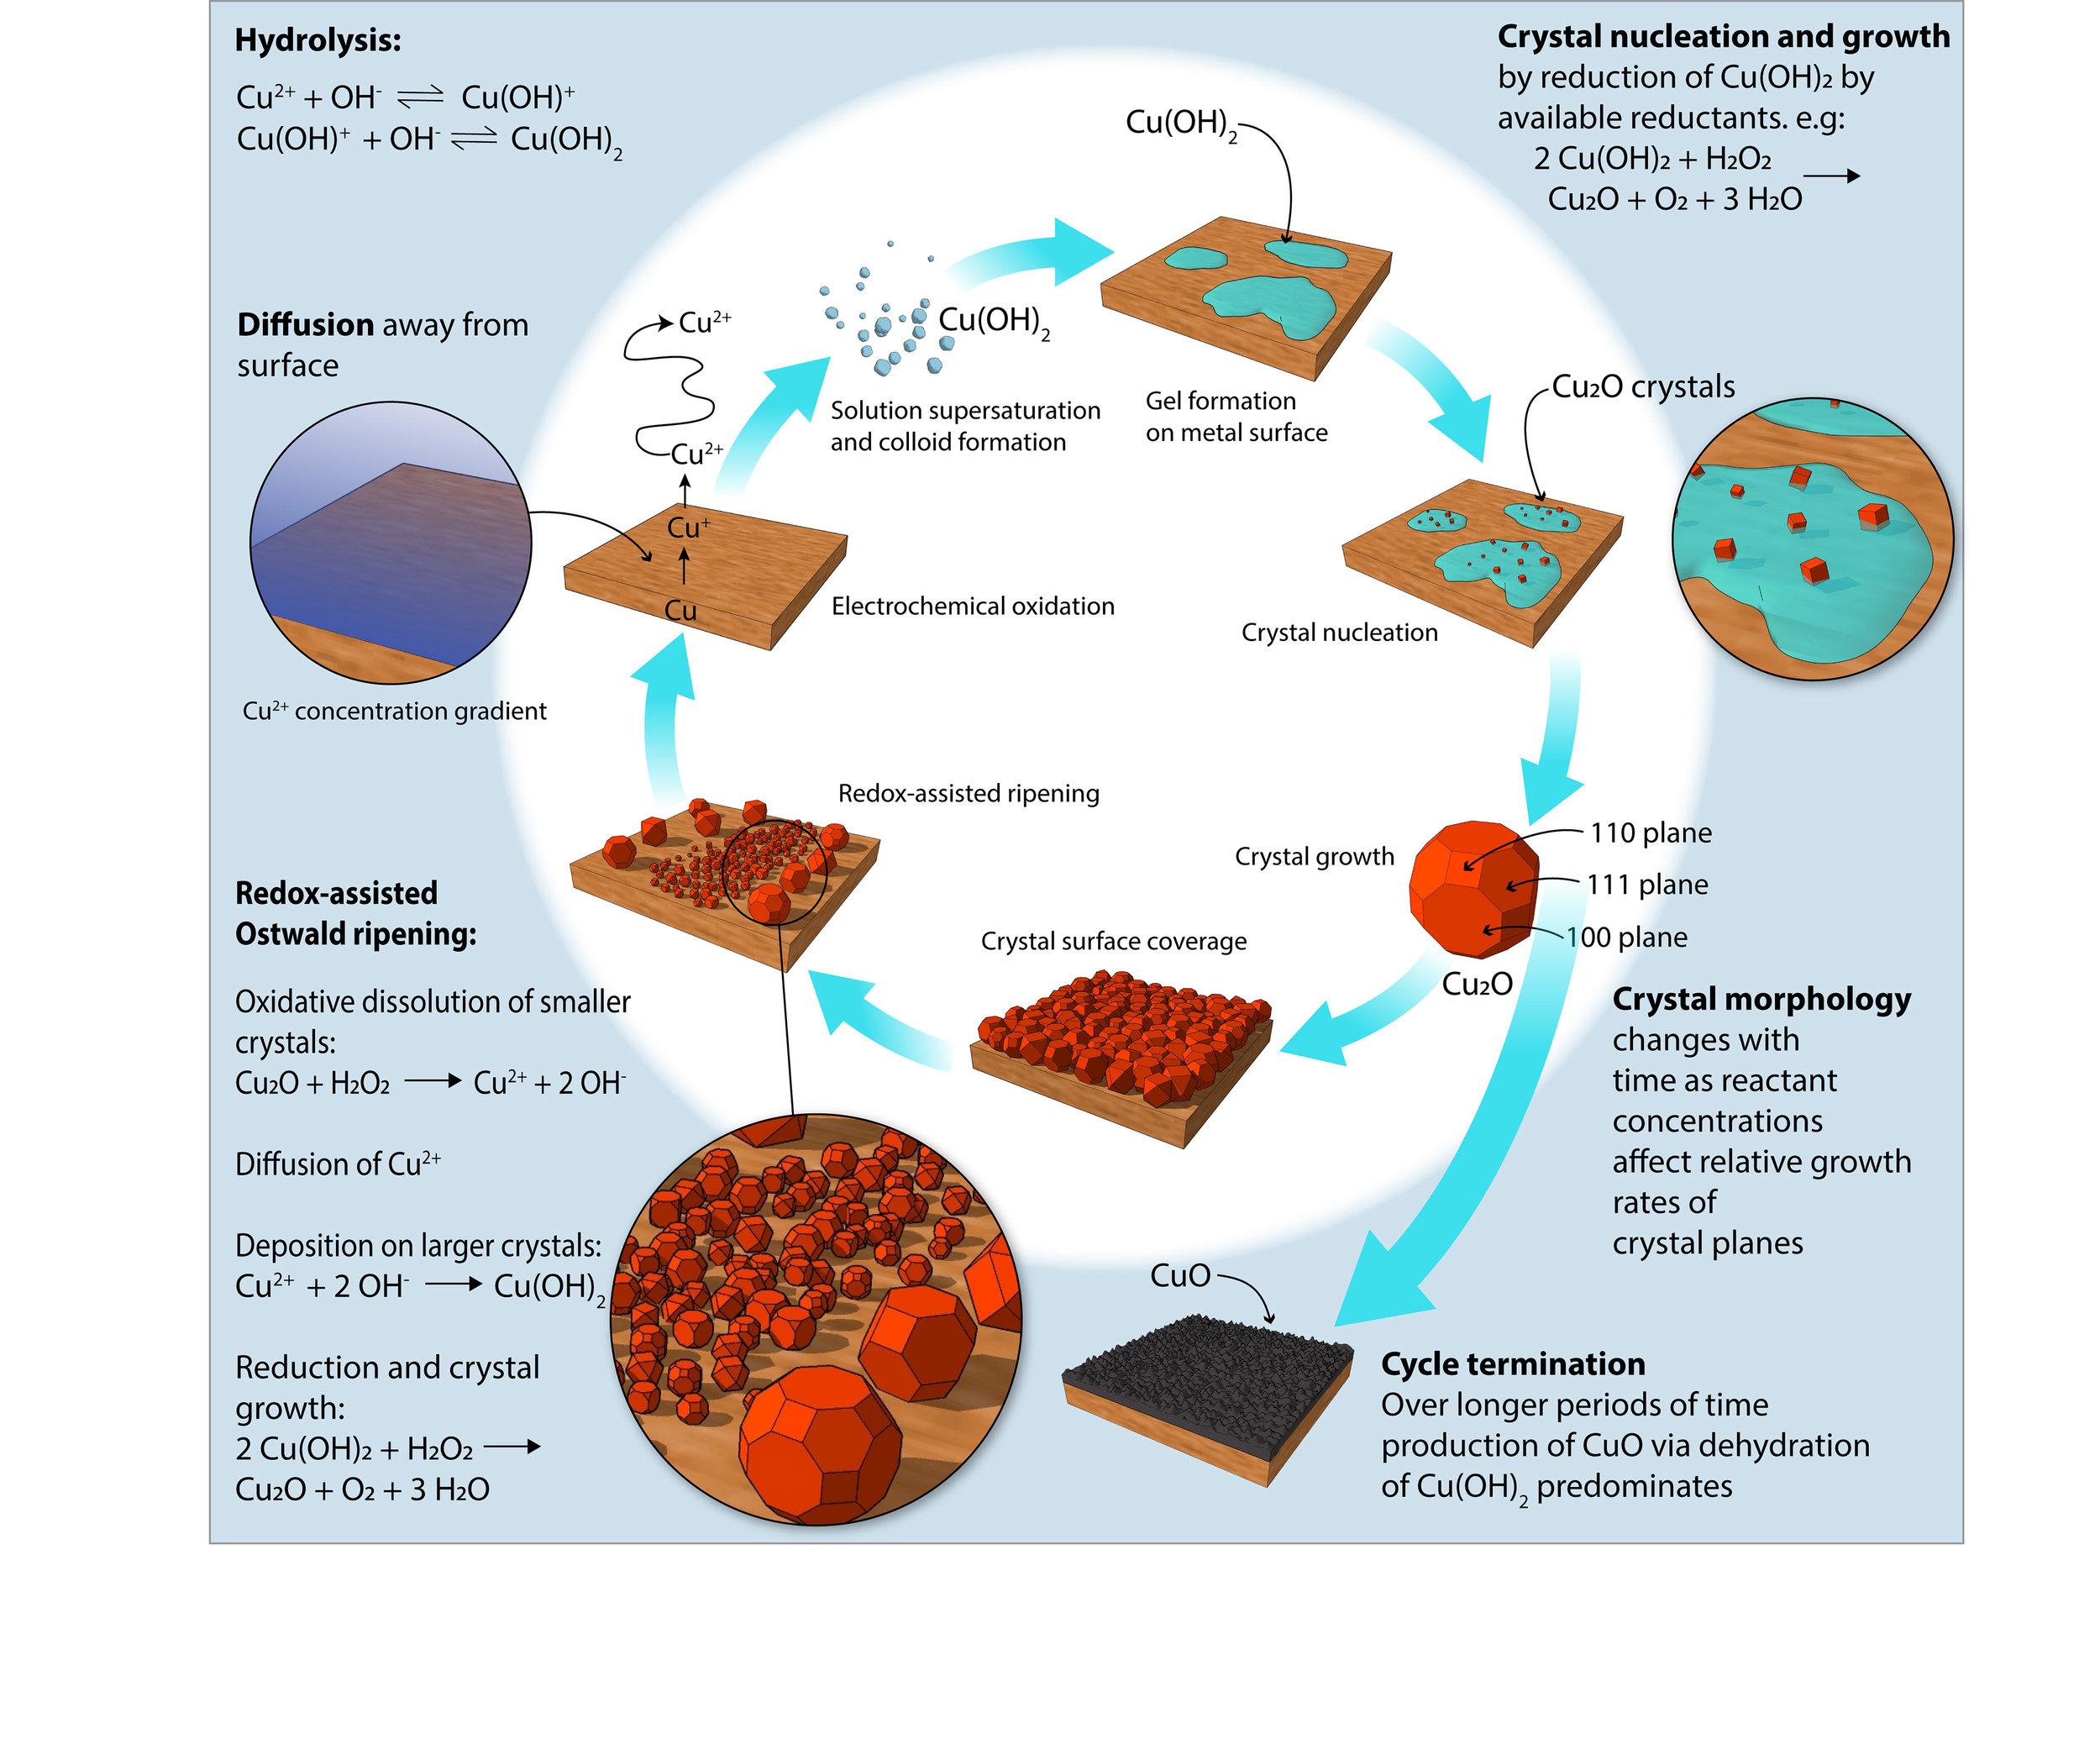 Copper corrosion mechanistic diagram